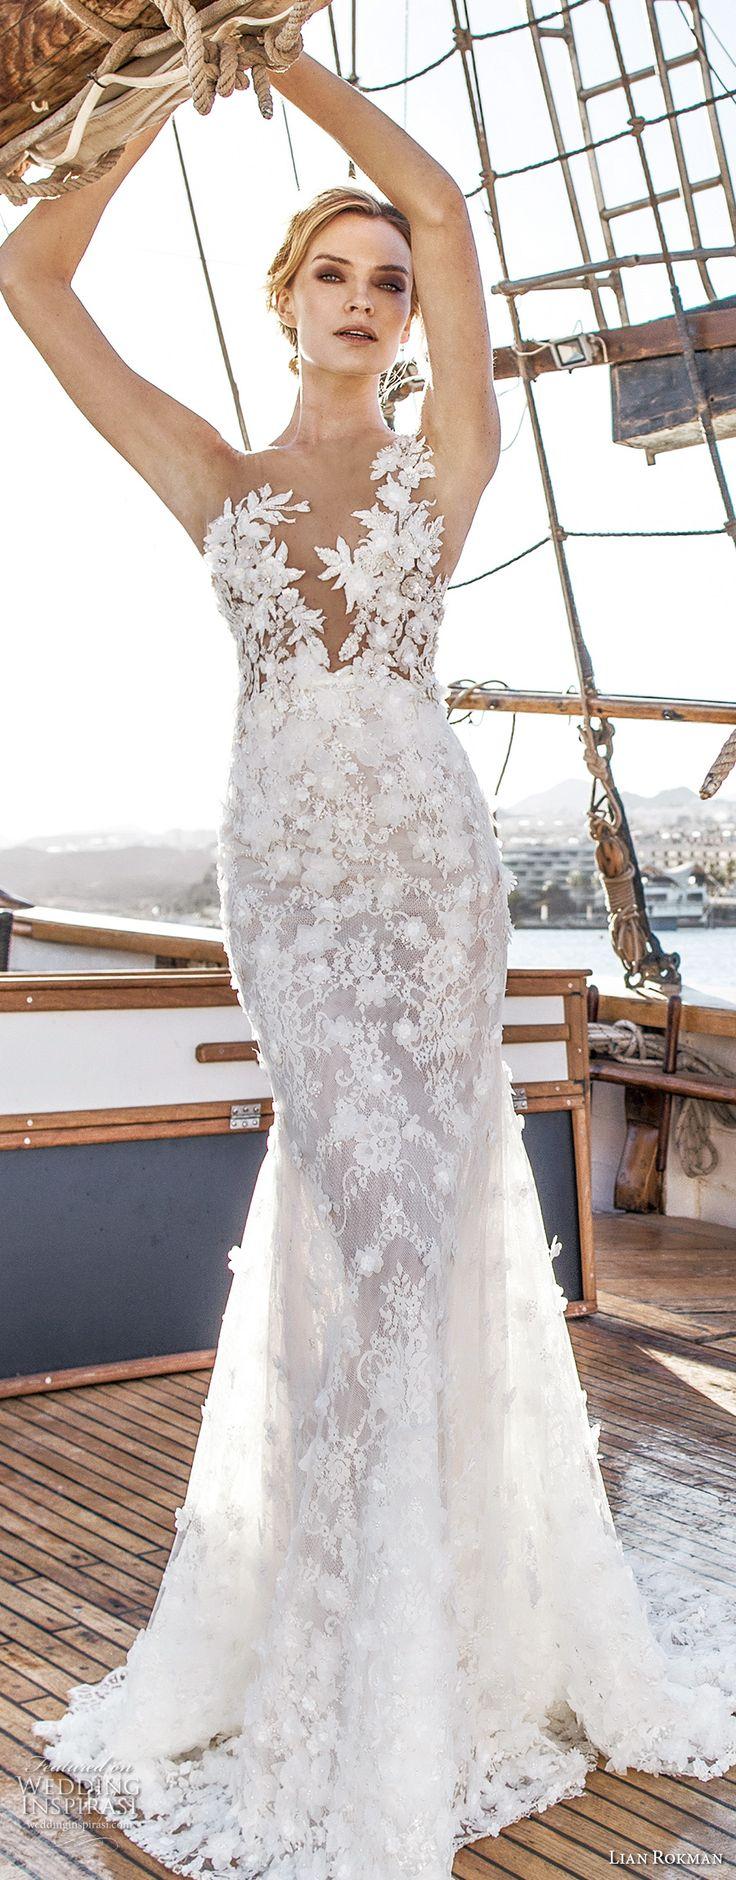 lian rokman 2017 bridal sleeveless deep v neck full embellishment elegant romantic trumpet mermaid wedding dress open back sweep train (jade) mv -- Lian Rokman 2017 Wedding Dresses